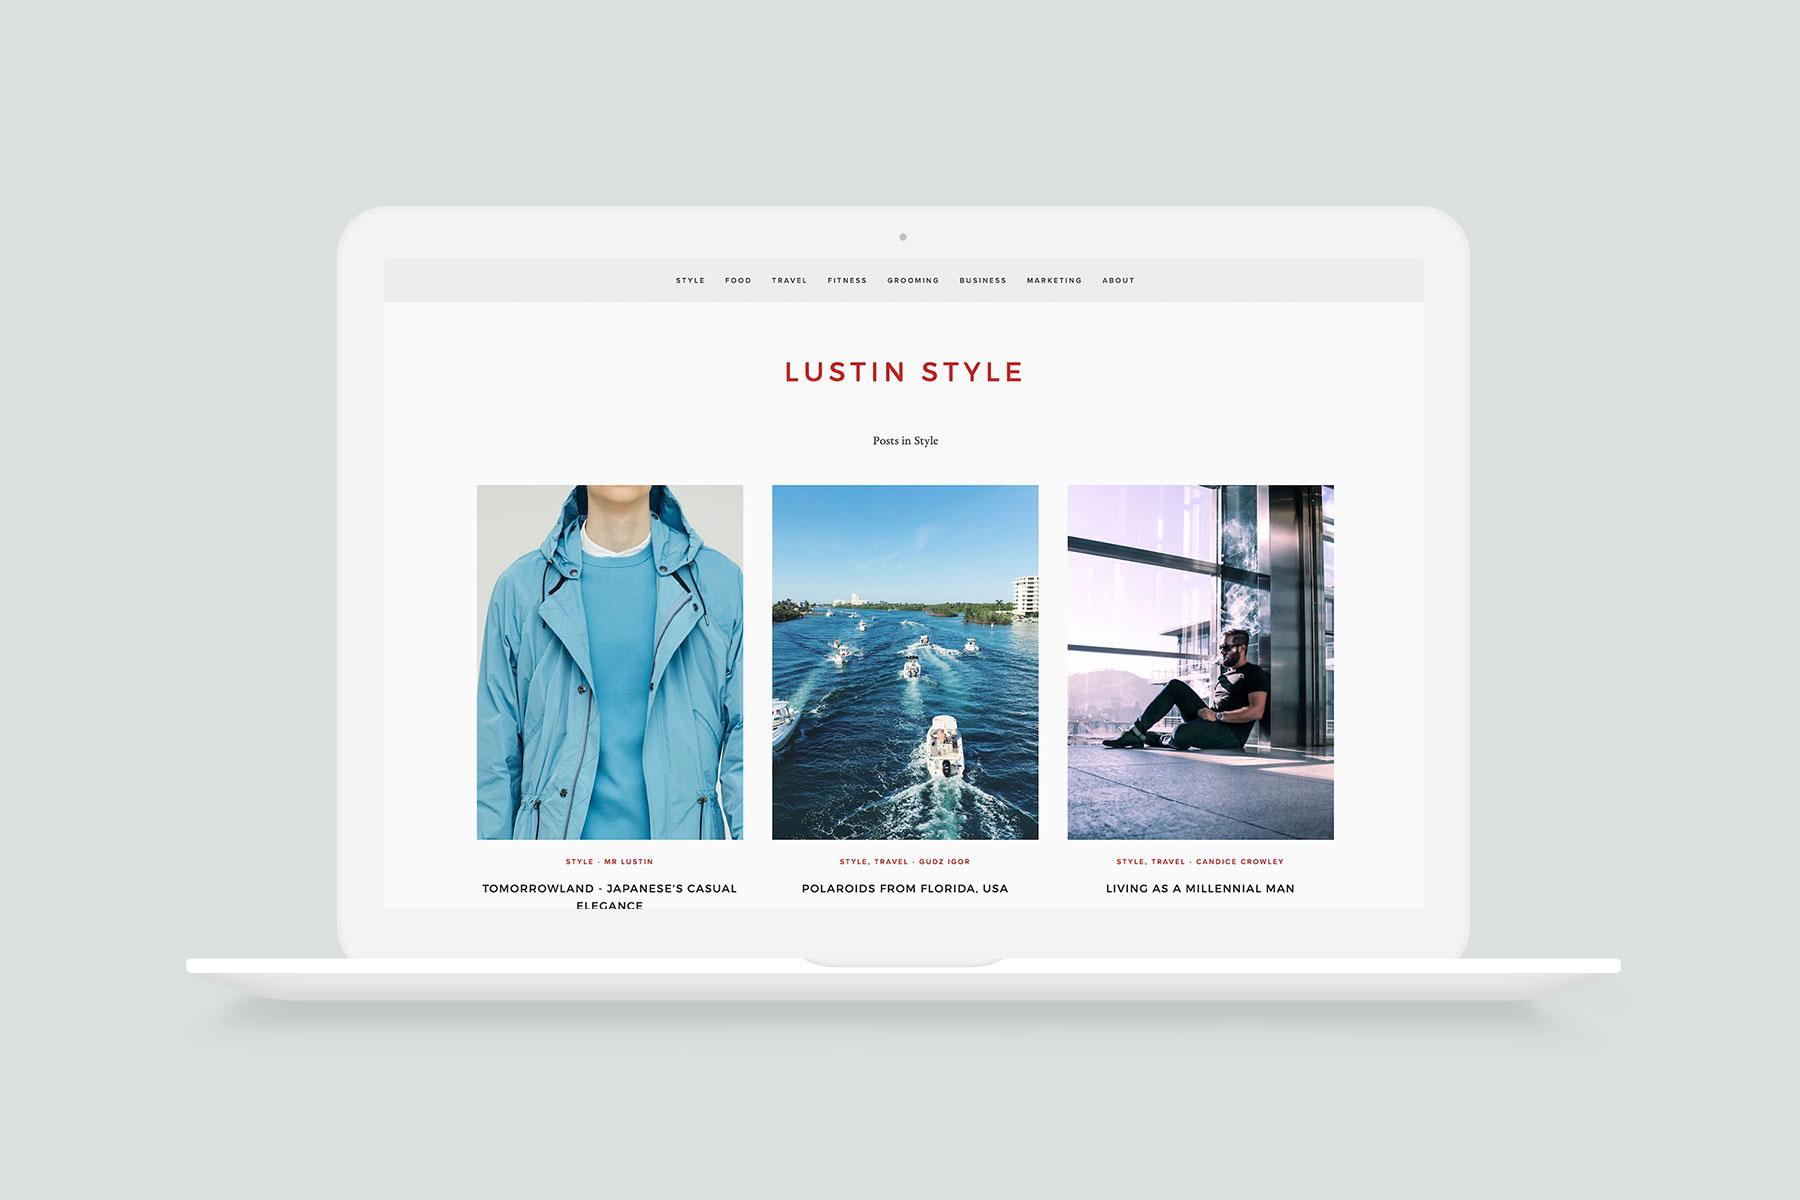 Lustin-Style-mockup.jpg